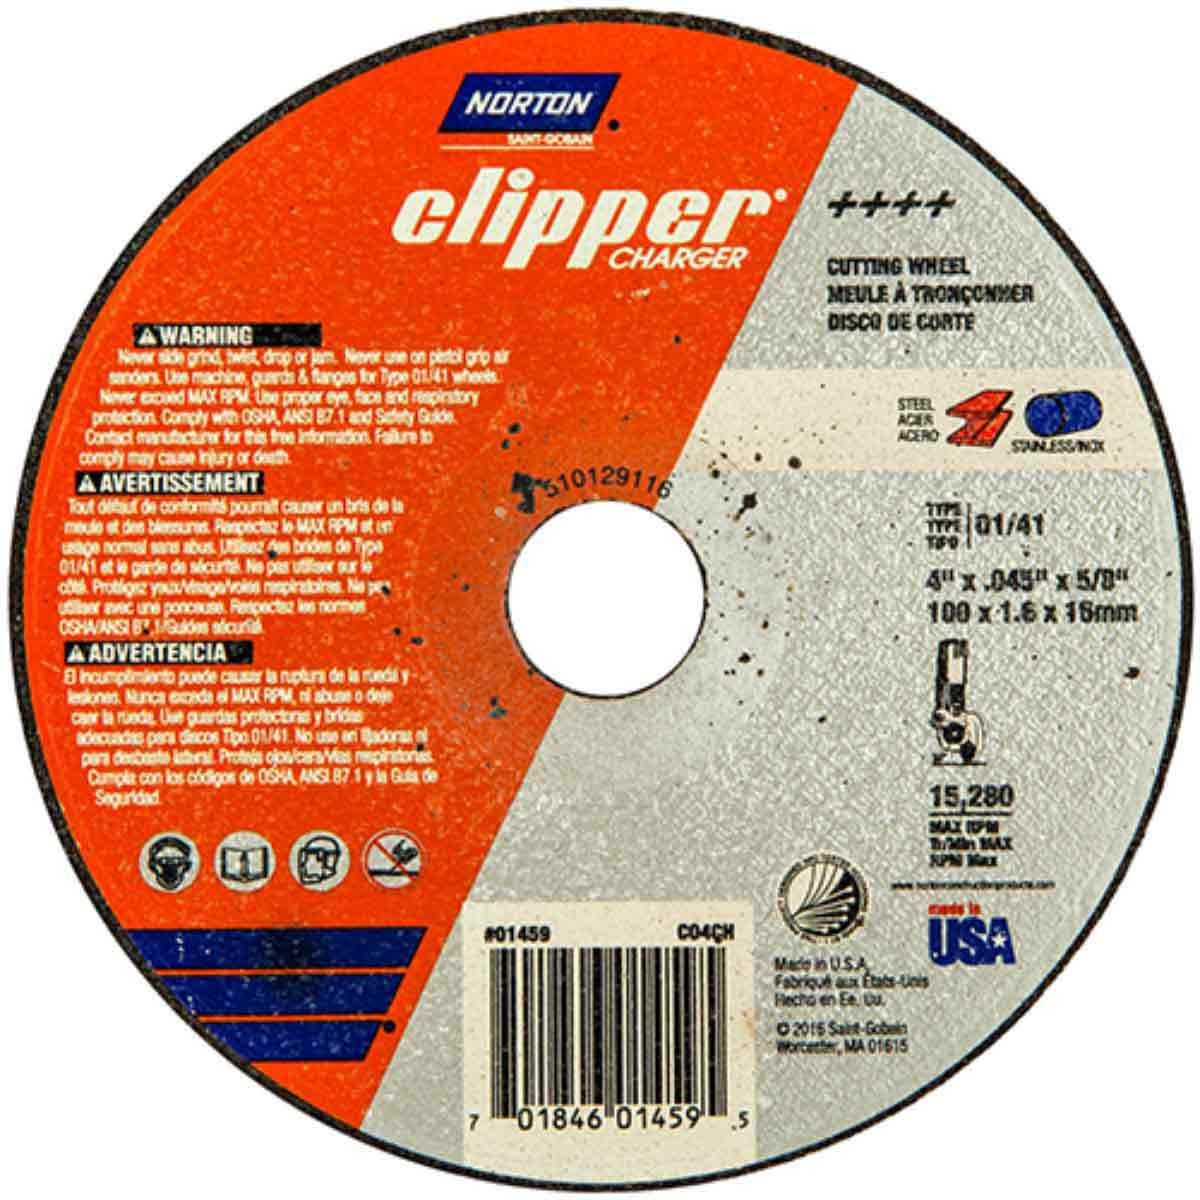 CO4CH Norton Abrasive Charger Cut-Off Wheels